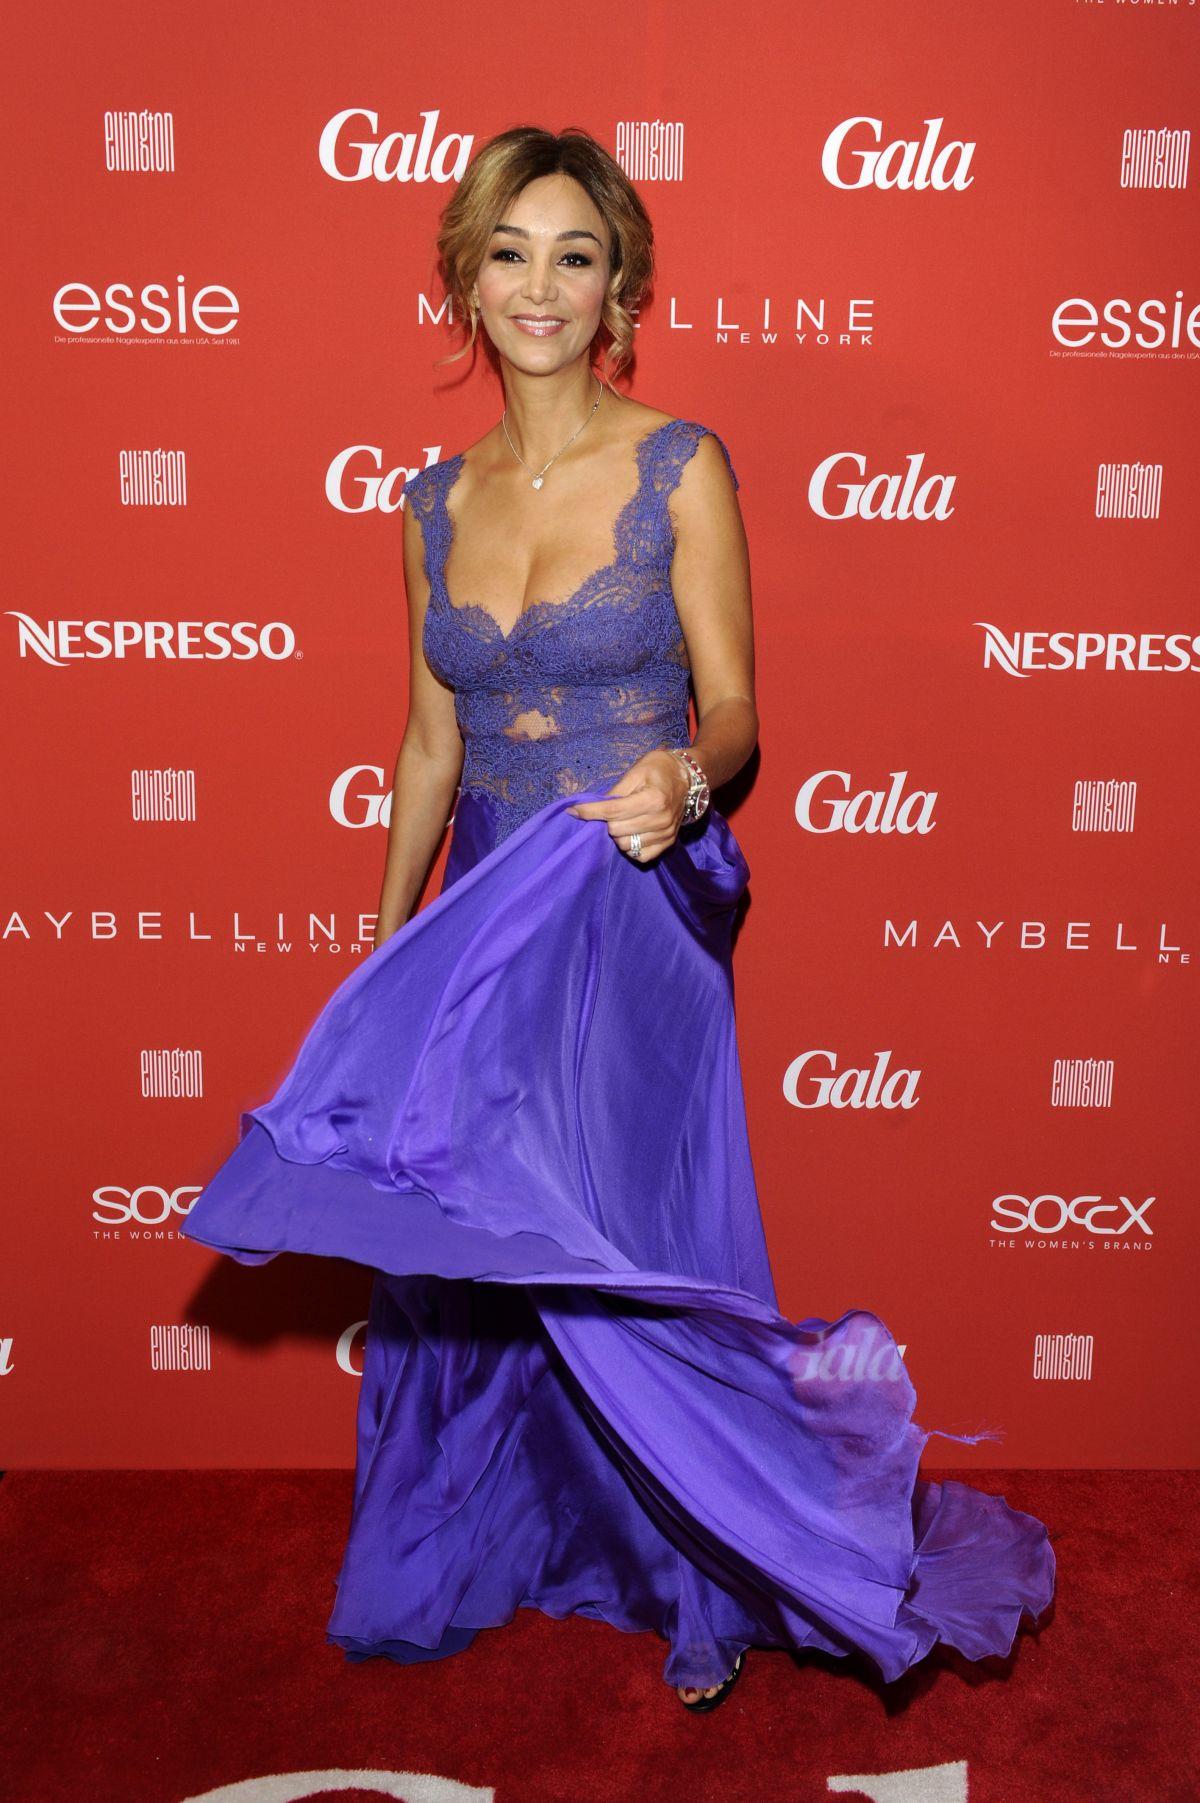 Verona Pooth At Gala Fashion Brunch In Berlin Hawtcelebs